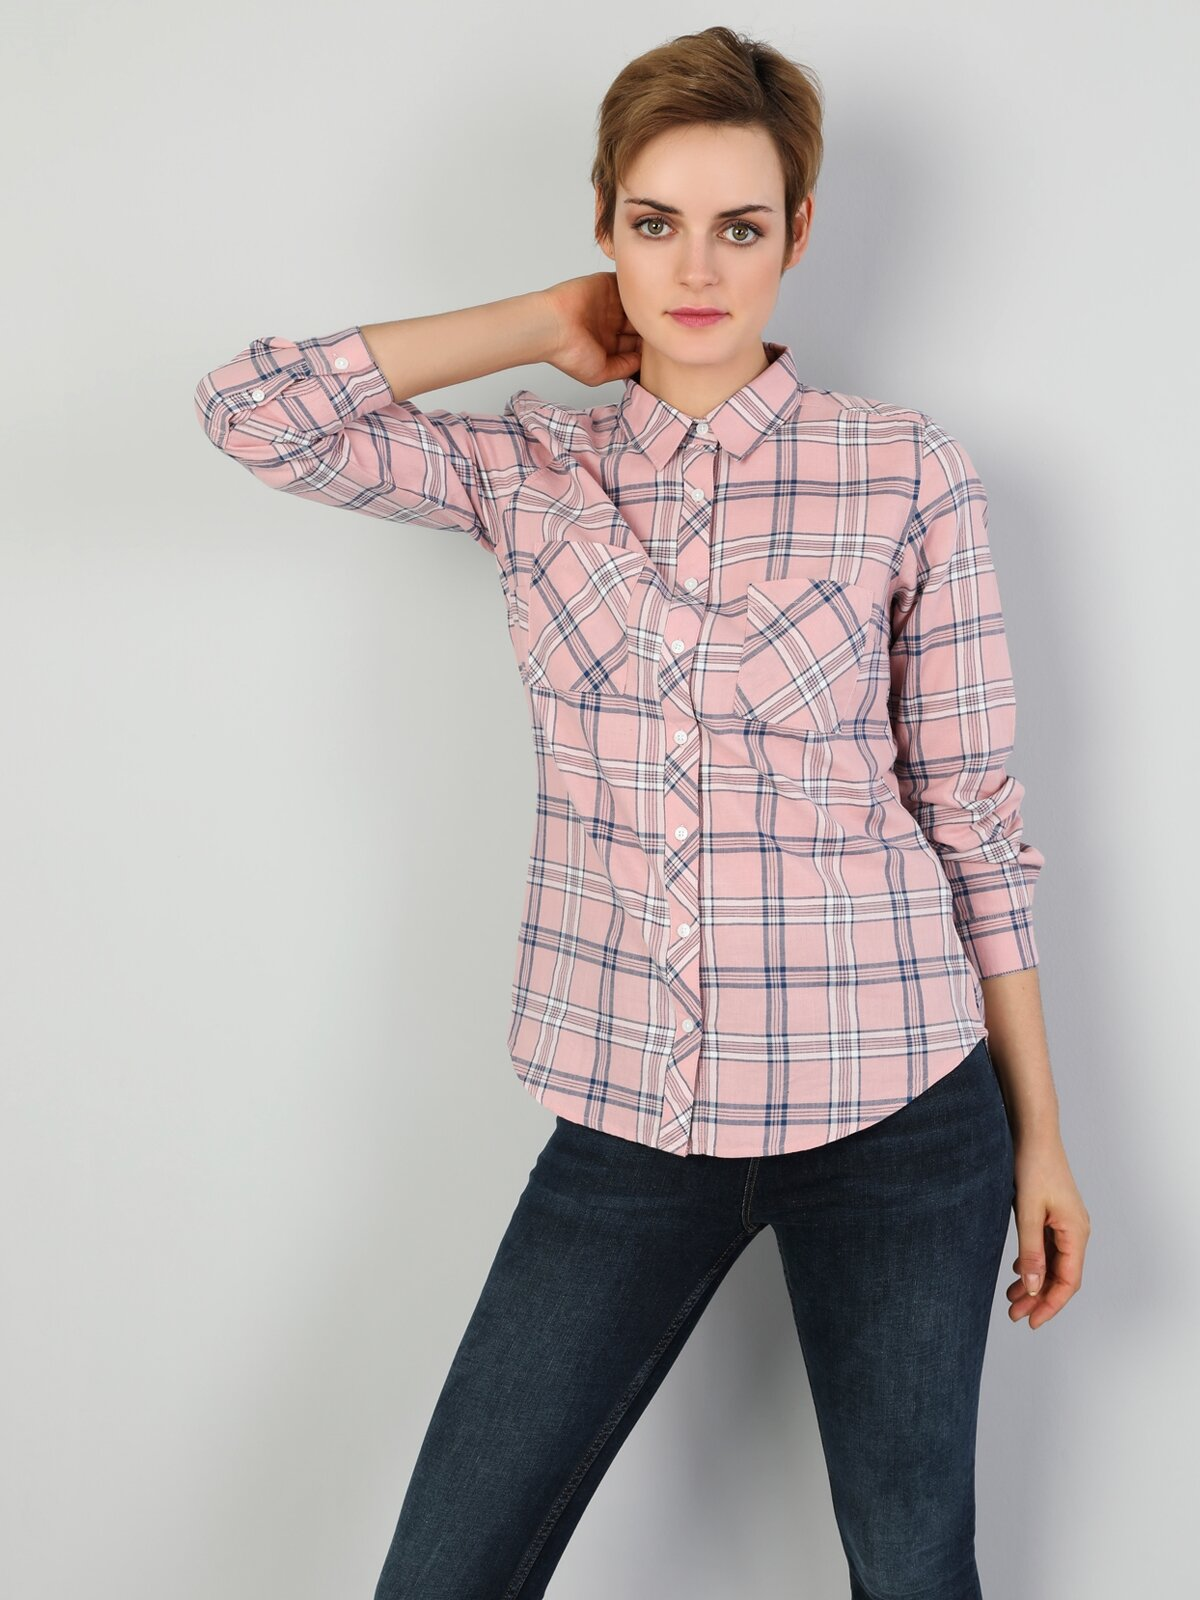 Super Slim Fit Shirt Neck Kadın Pembe Uzun Kol Gömlek